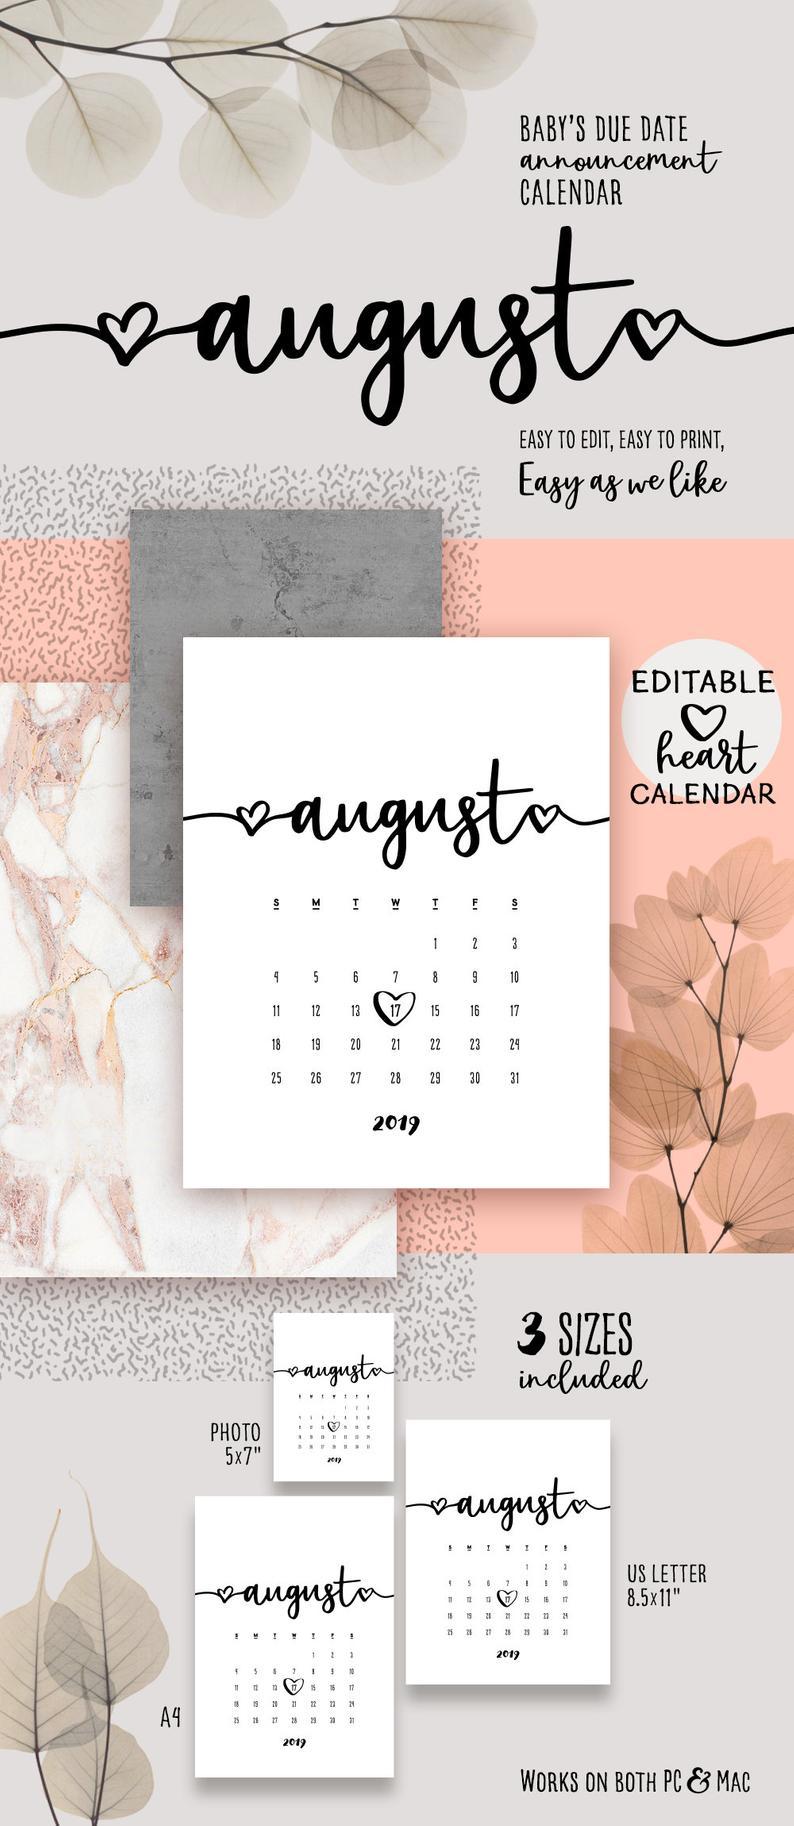 August 2019 Printable Calendar - Lovely Baby Due Date Announcement  Pregnancy Calendar Heart Pdf Reveal Baby Announce Diy Printable Calendar